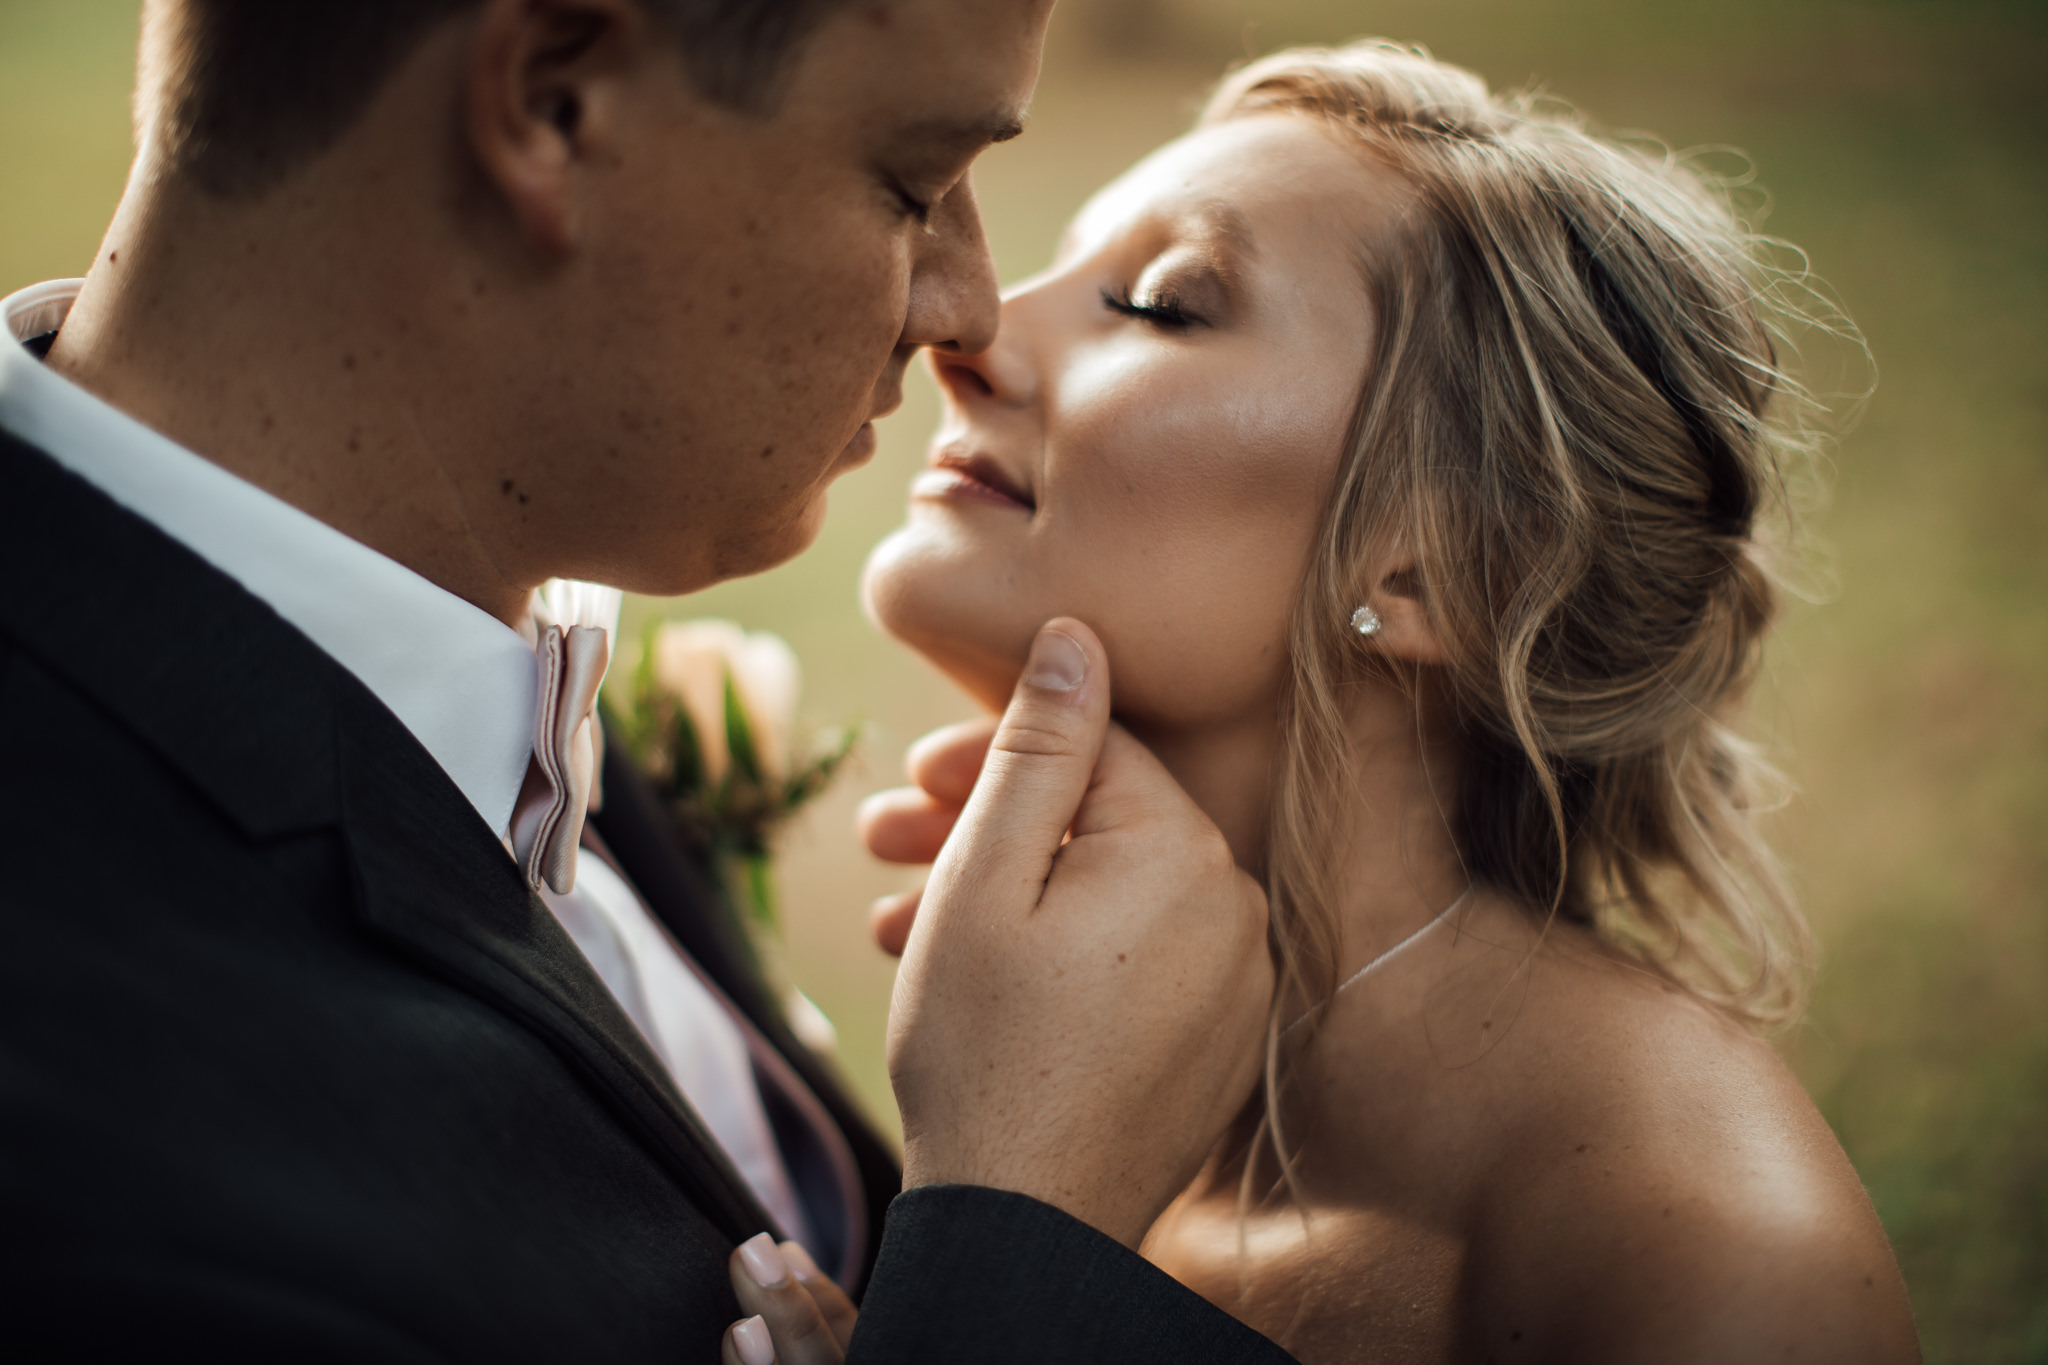 davis-home-strawberry-plains-wedding-cassie-cook-photography-memphis-wedding-photographer-81.jpg